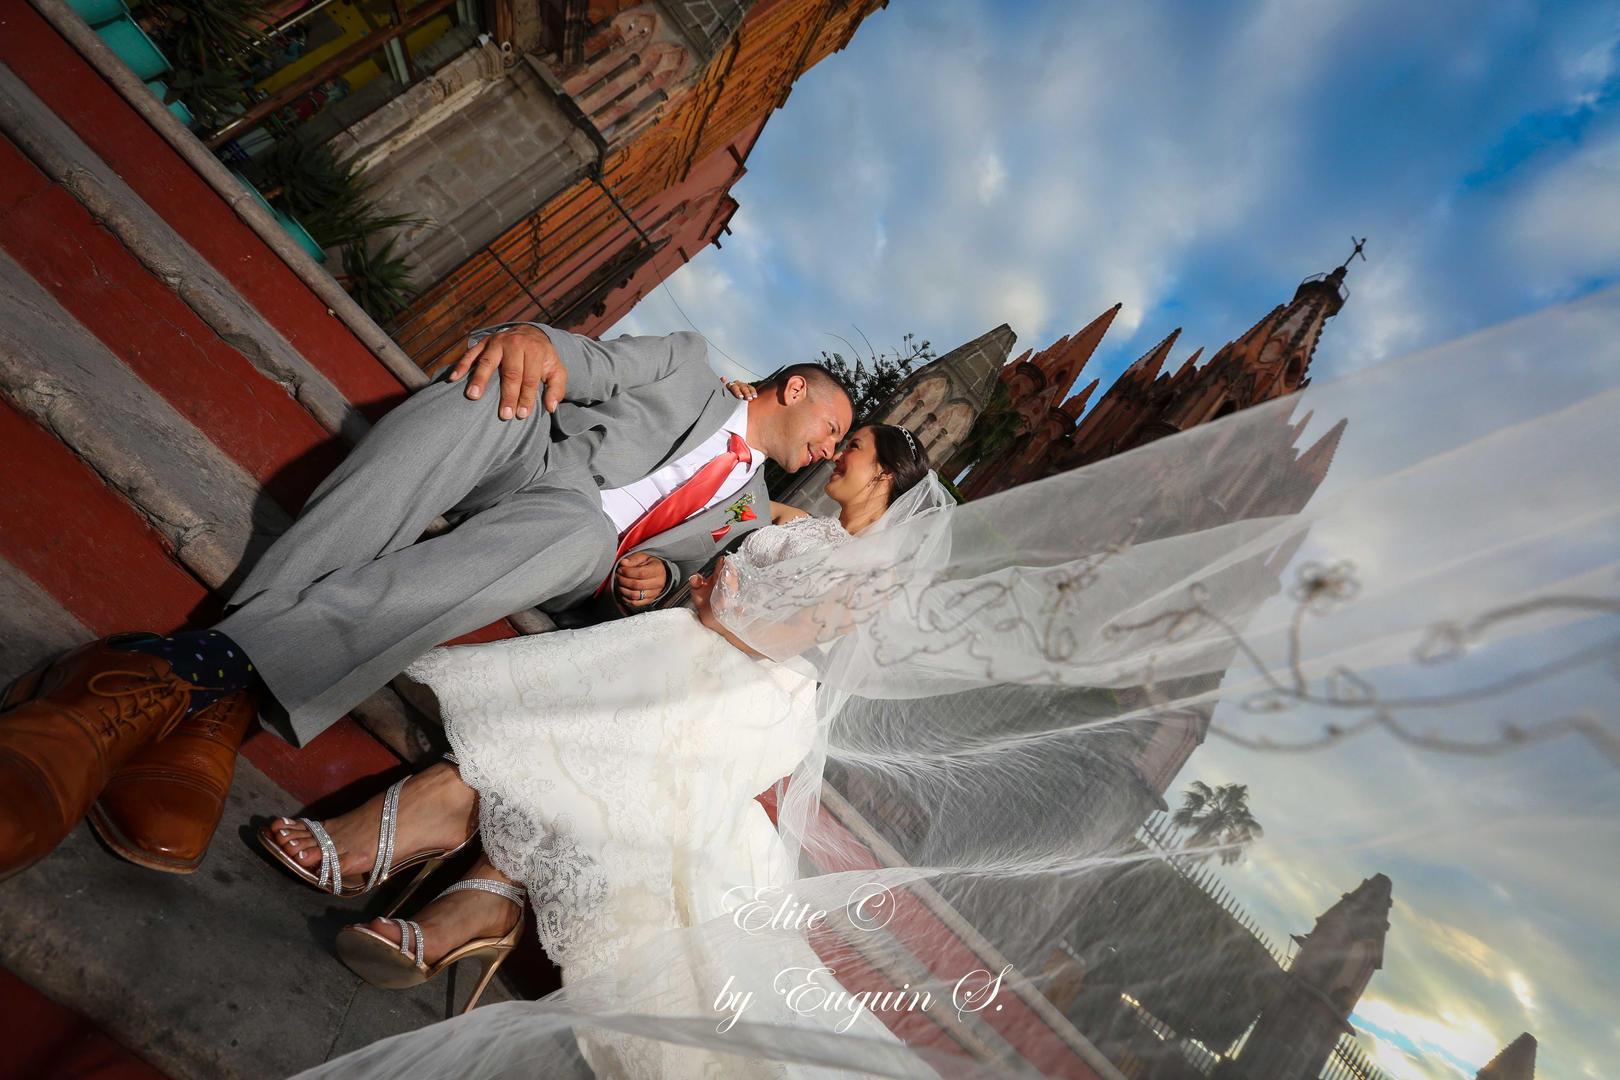 Parroquia de San Miguel Wedding photo